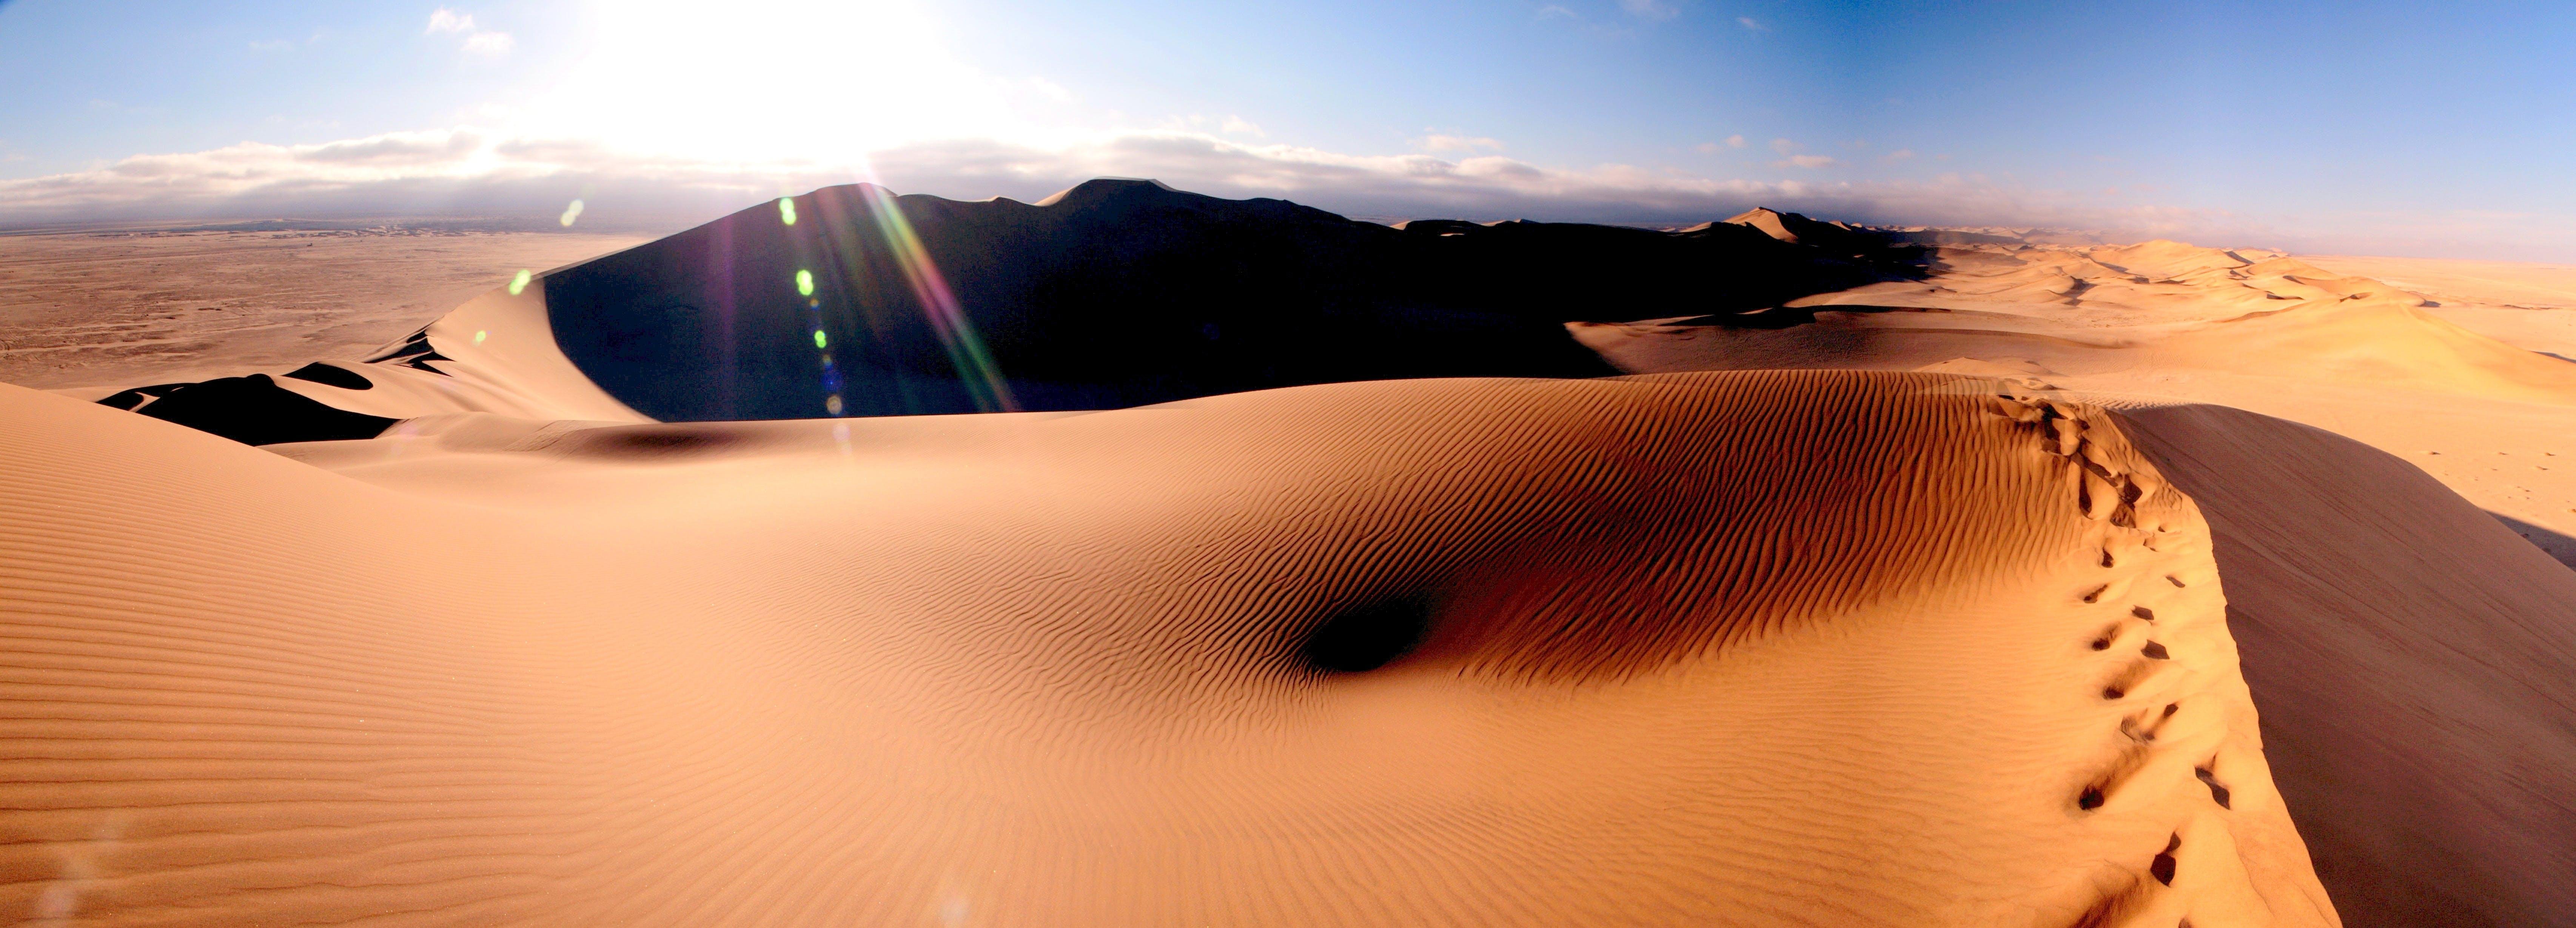 desert, dunes, hot